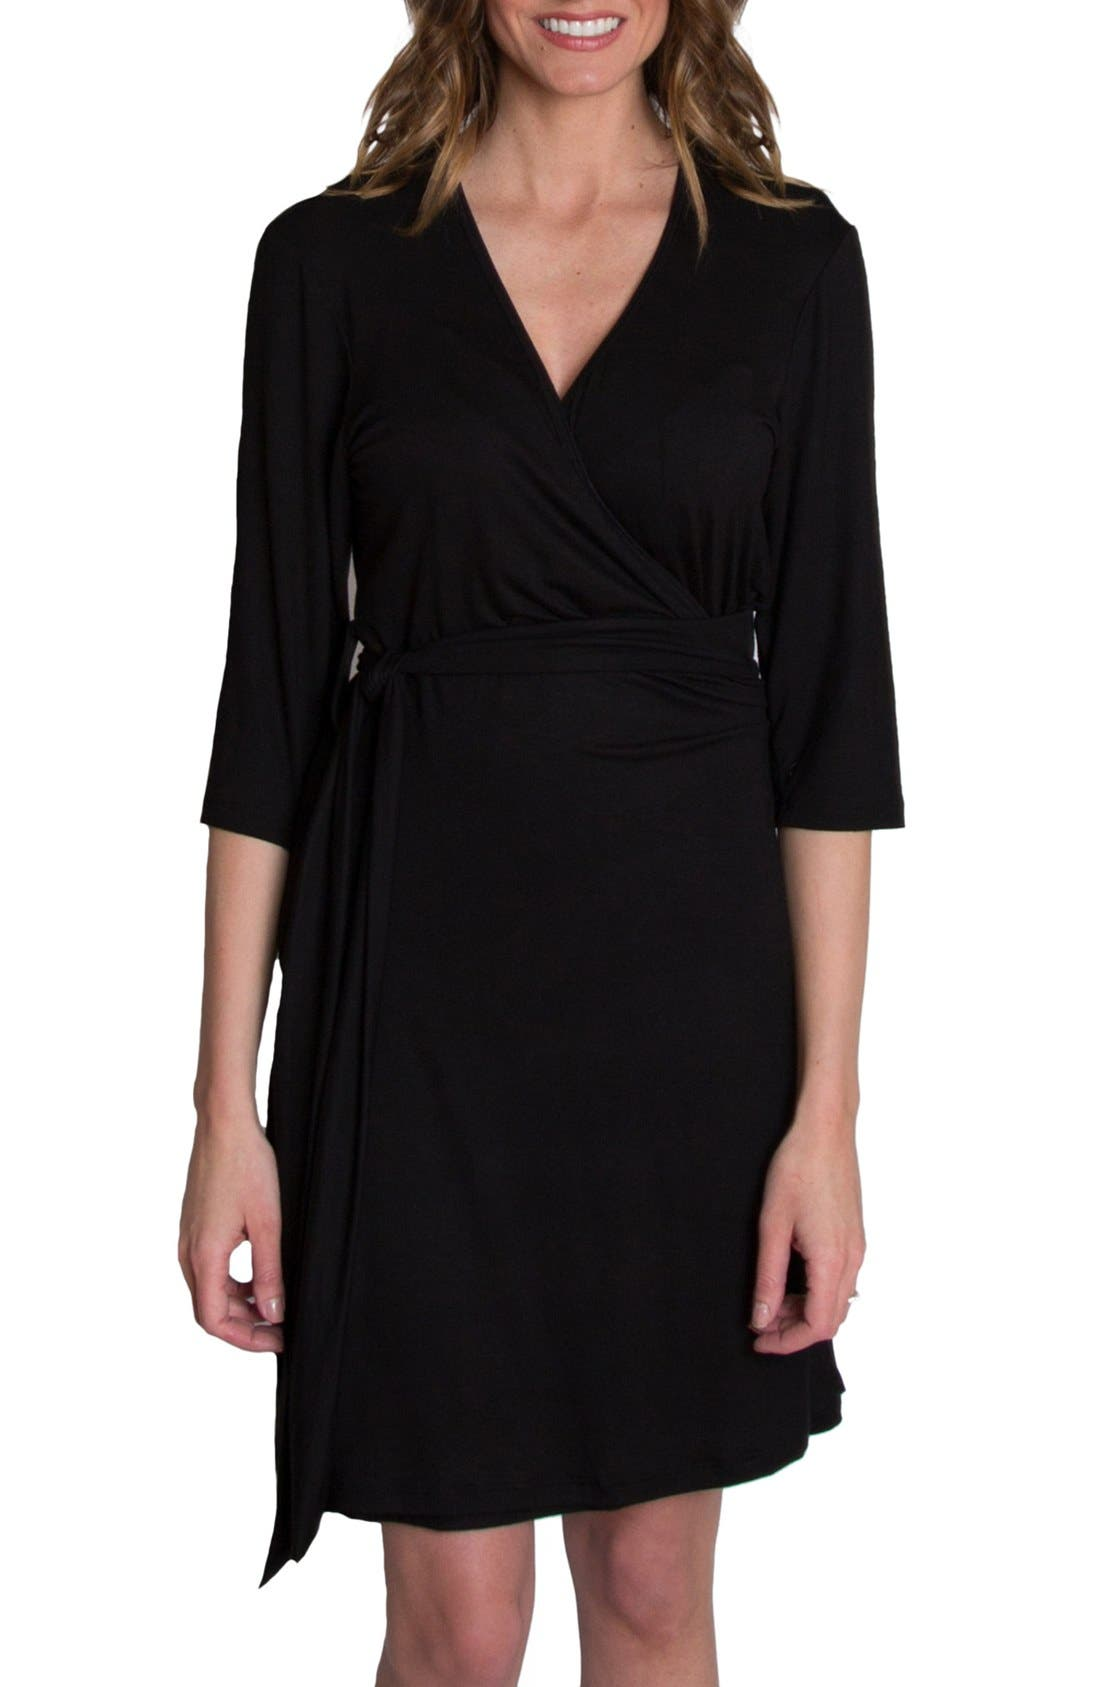 UDDERLY HOT MAMA, 'Whimsical' Nursing Wrap Dress, Main thumbnail 1, color, BLACK